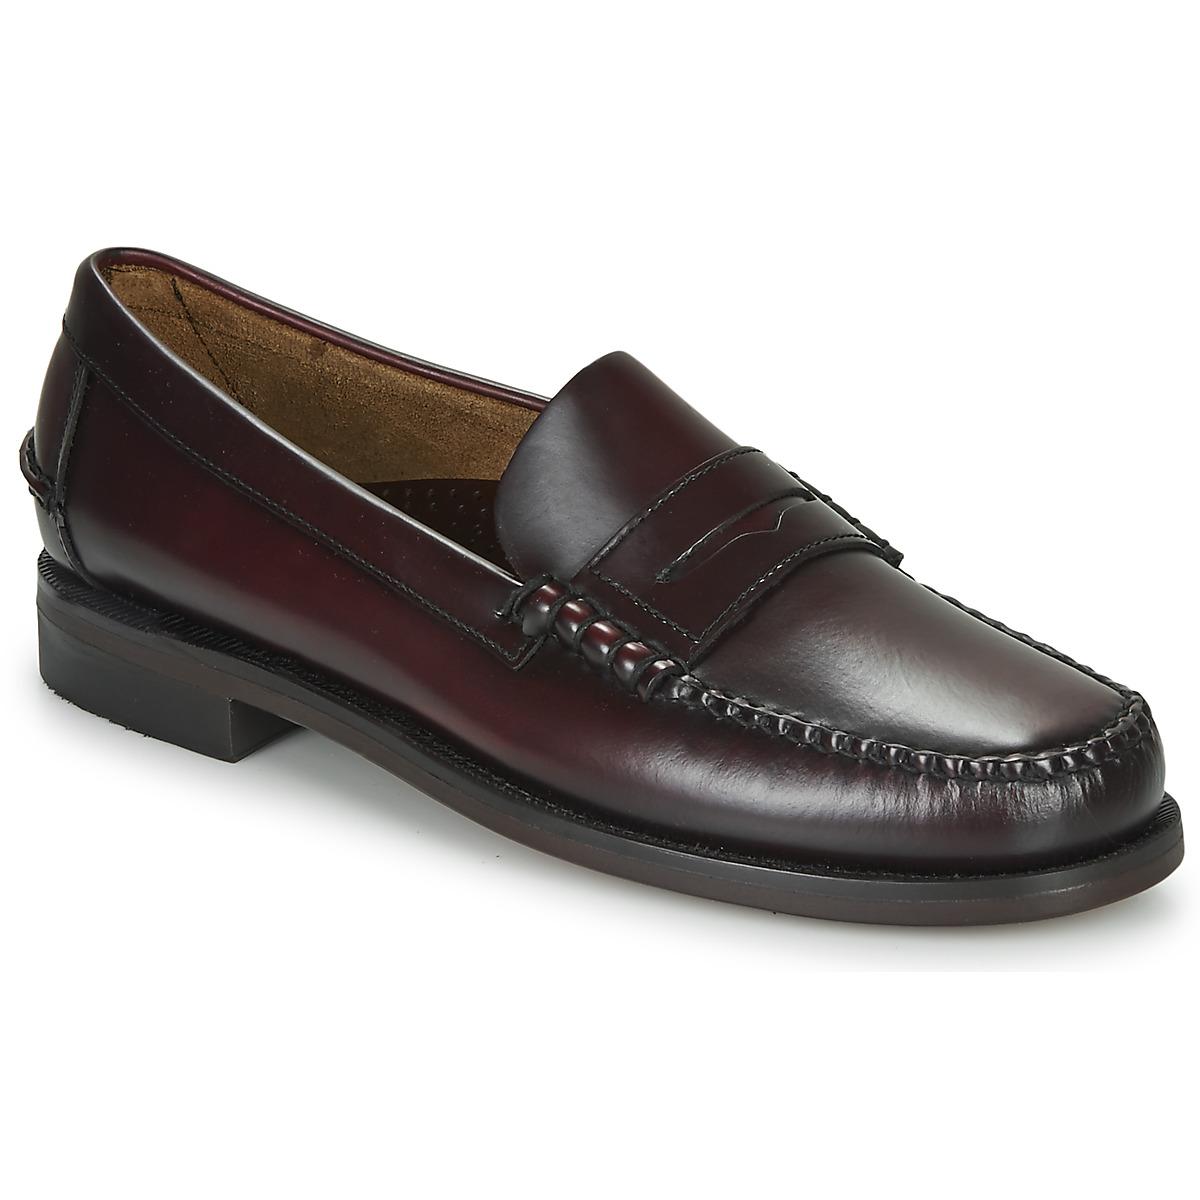 Sebago Classic Leather Mens Formal Slip On Casual Smart Loafer Shoes UK5-15